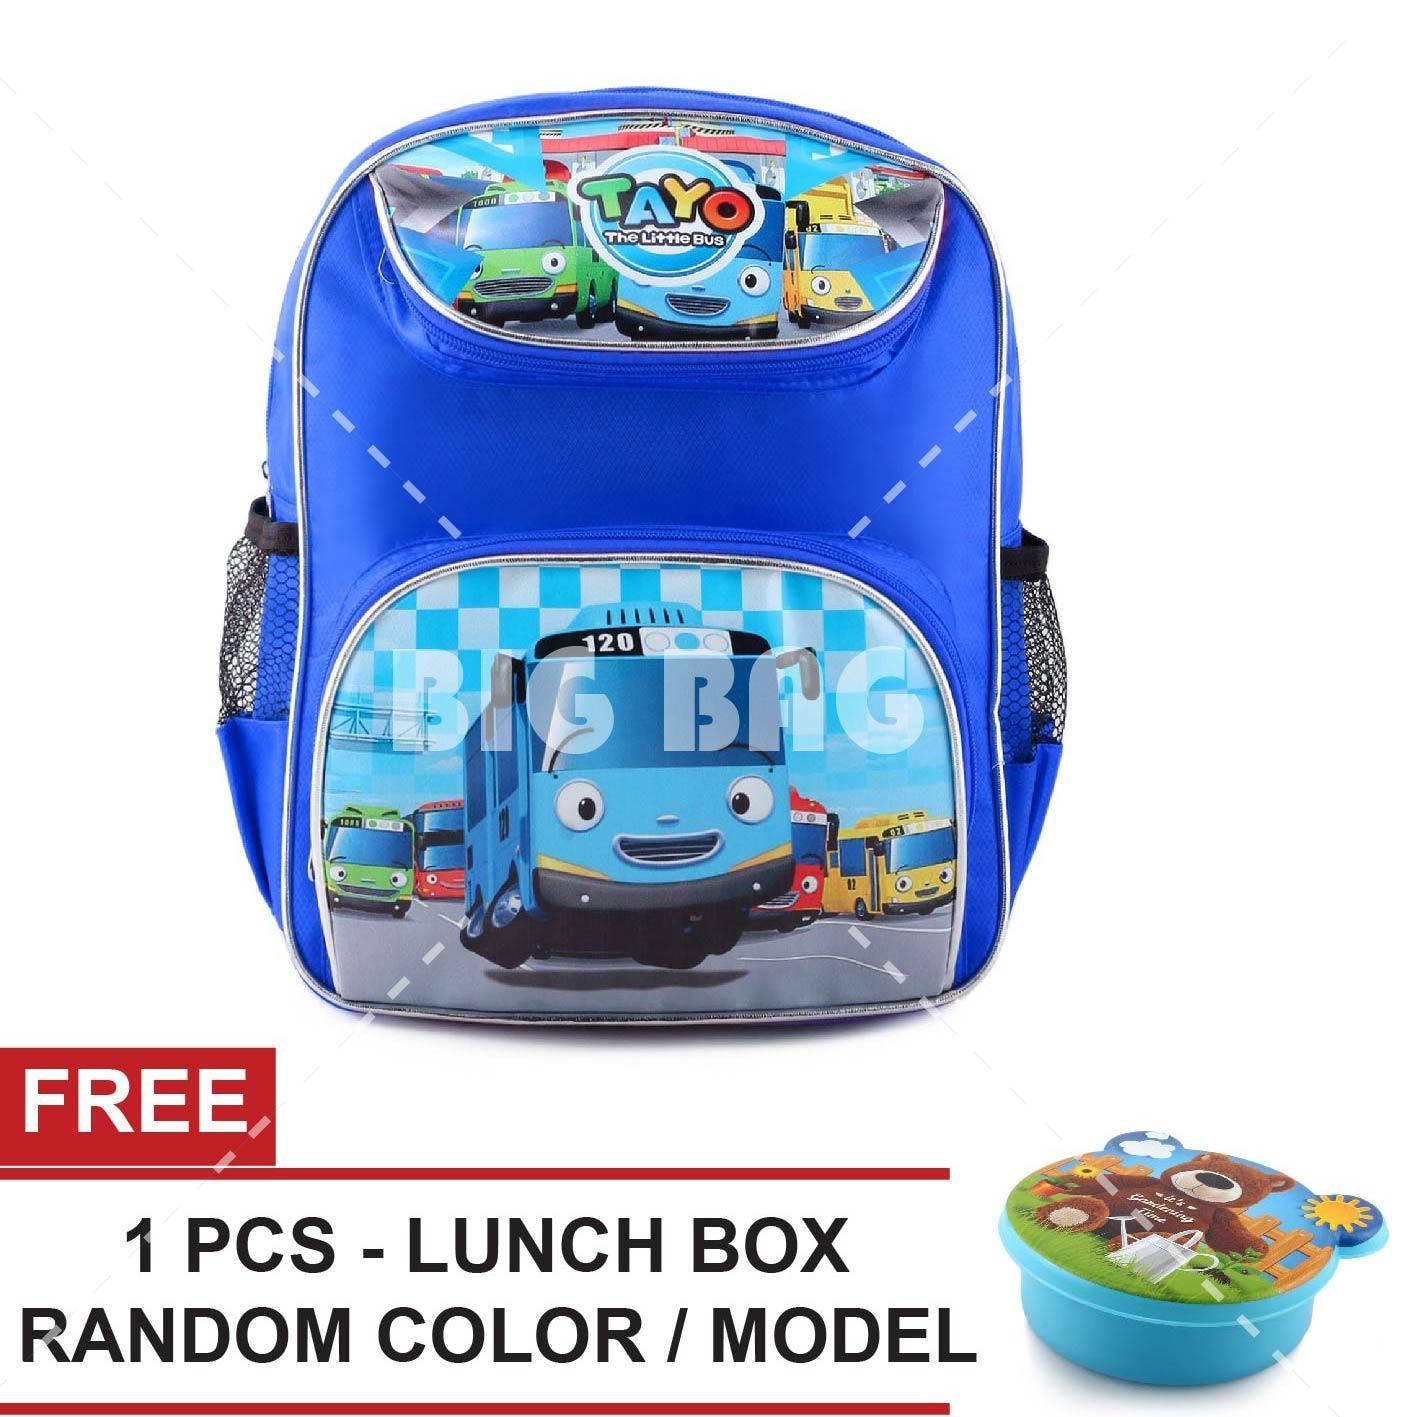 Tas Ransel Anak - Tayo The Little Bus - Lets Go - School Bag Tas Sekolah Anak - BLUE + FREE Lunchbox Random Color / Model Tas Anak Tas Sekolah Tas Anak Karakter